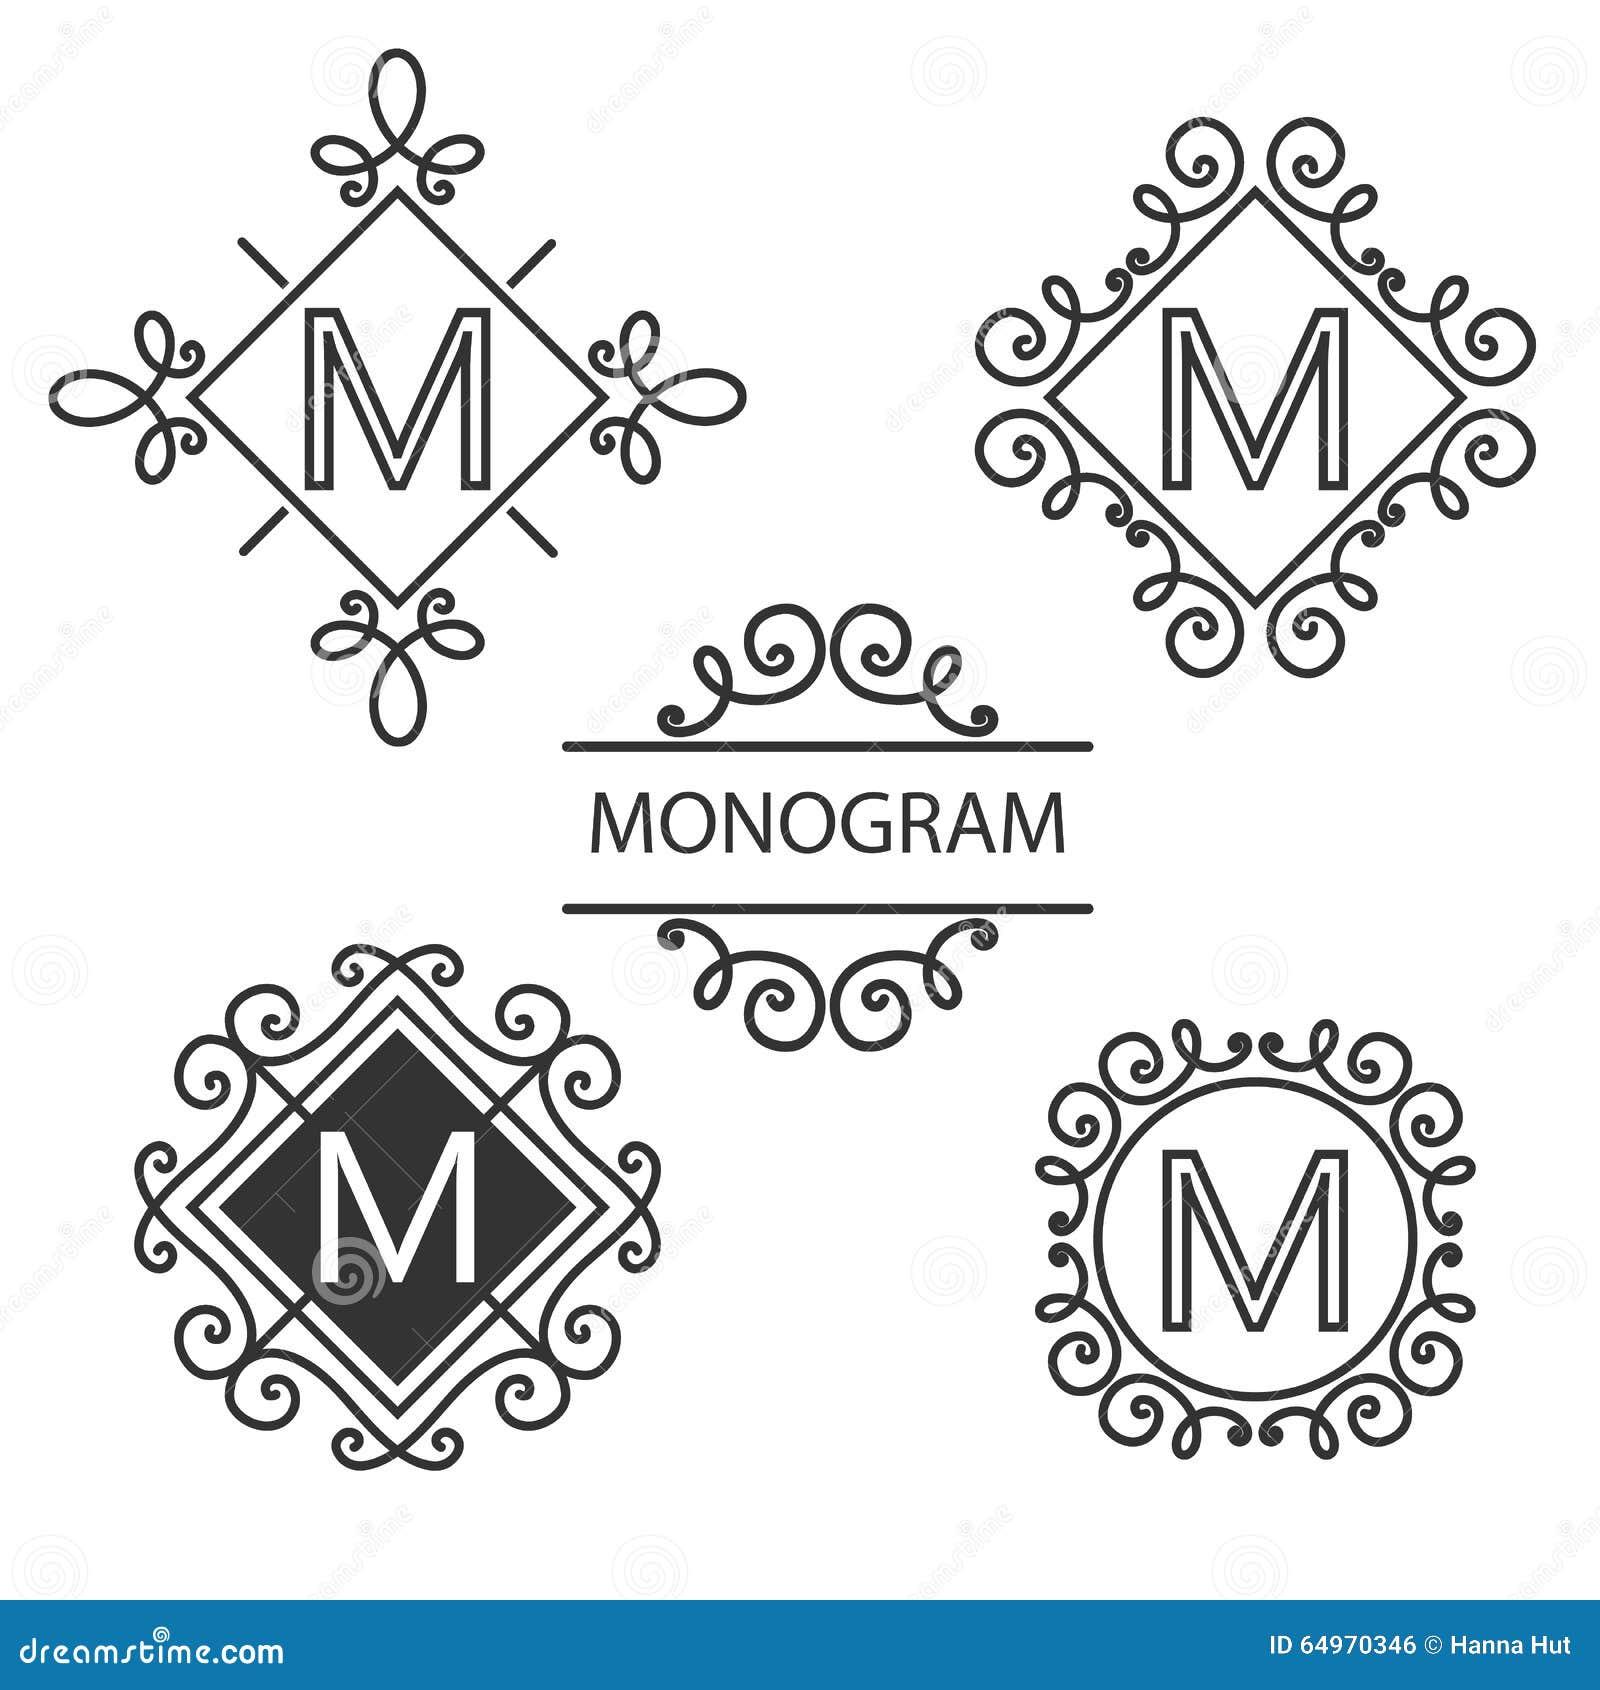 Simple Elegant Line Art : Simple and graceful monogram design template stock vector